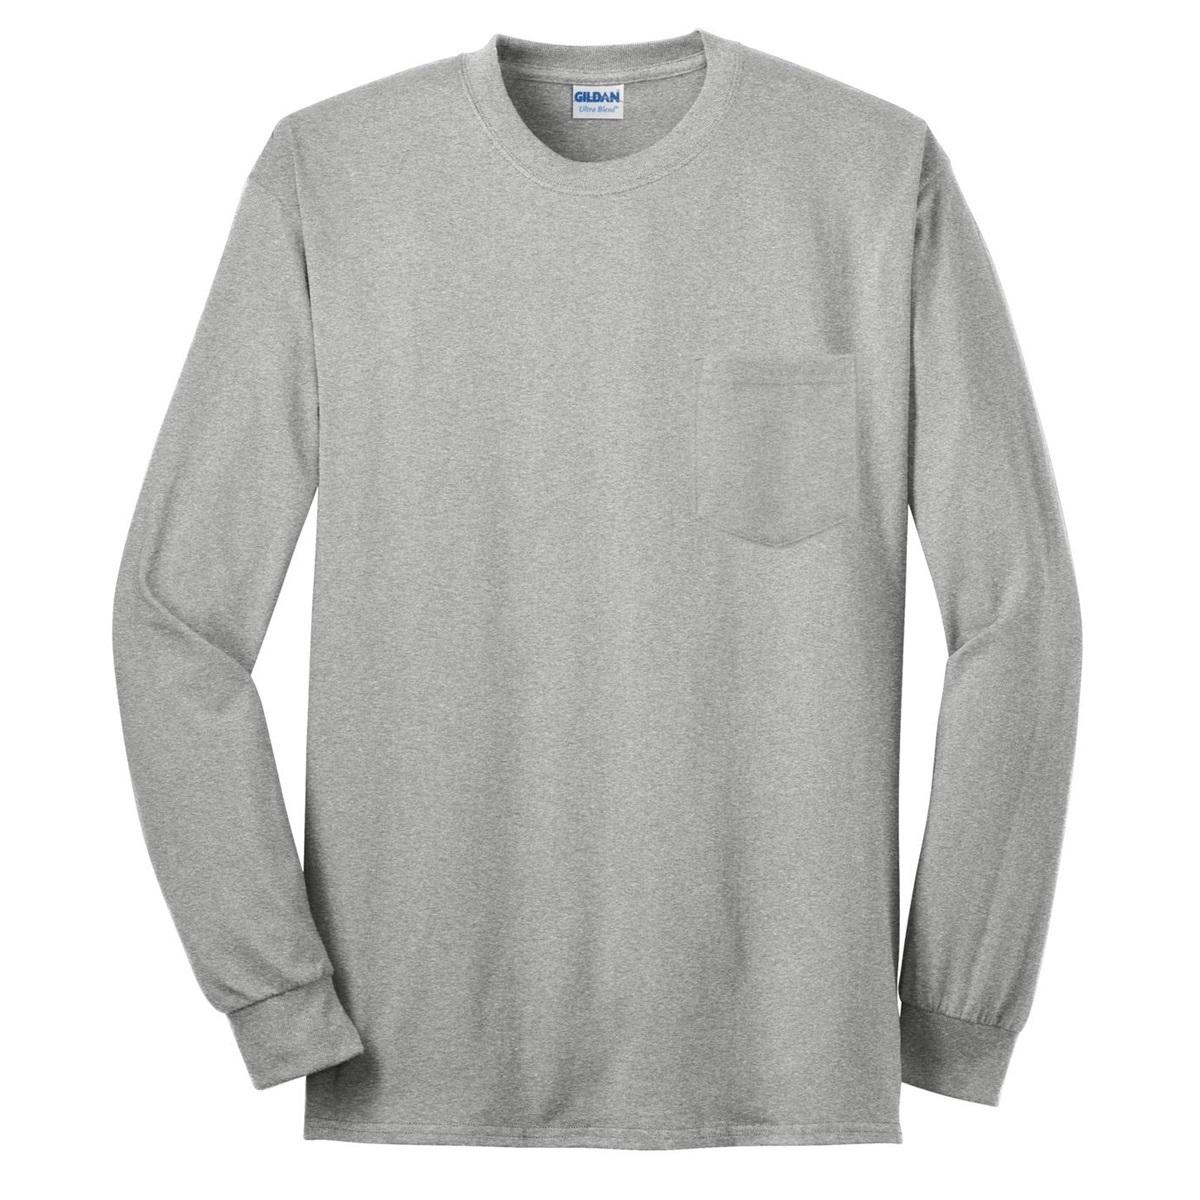 Gildan 2410 ultra cotton long sleeve t shirt with pocket for Grey long sleeve shirts